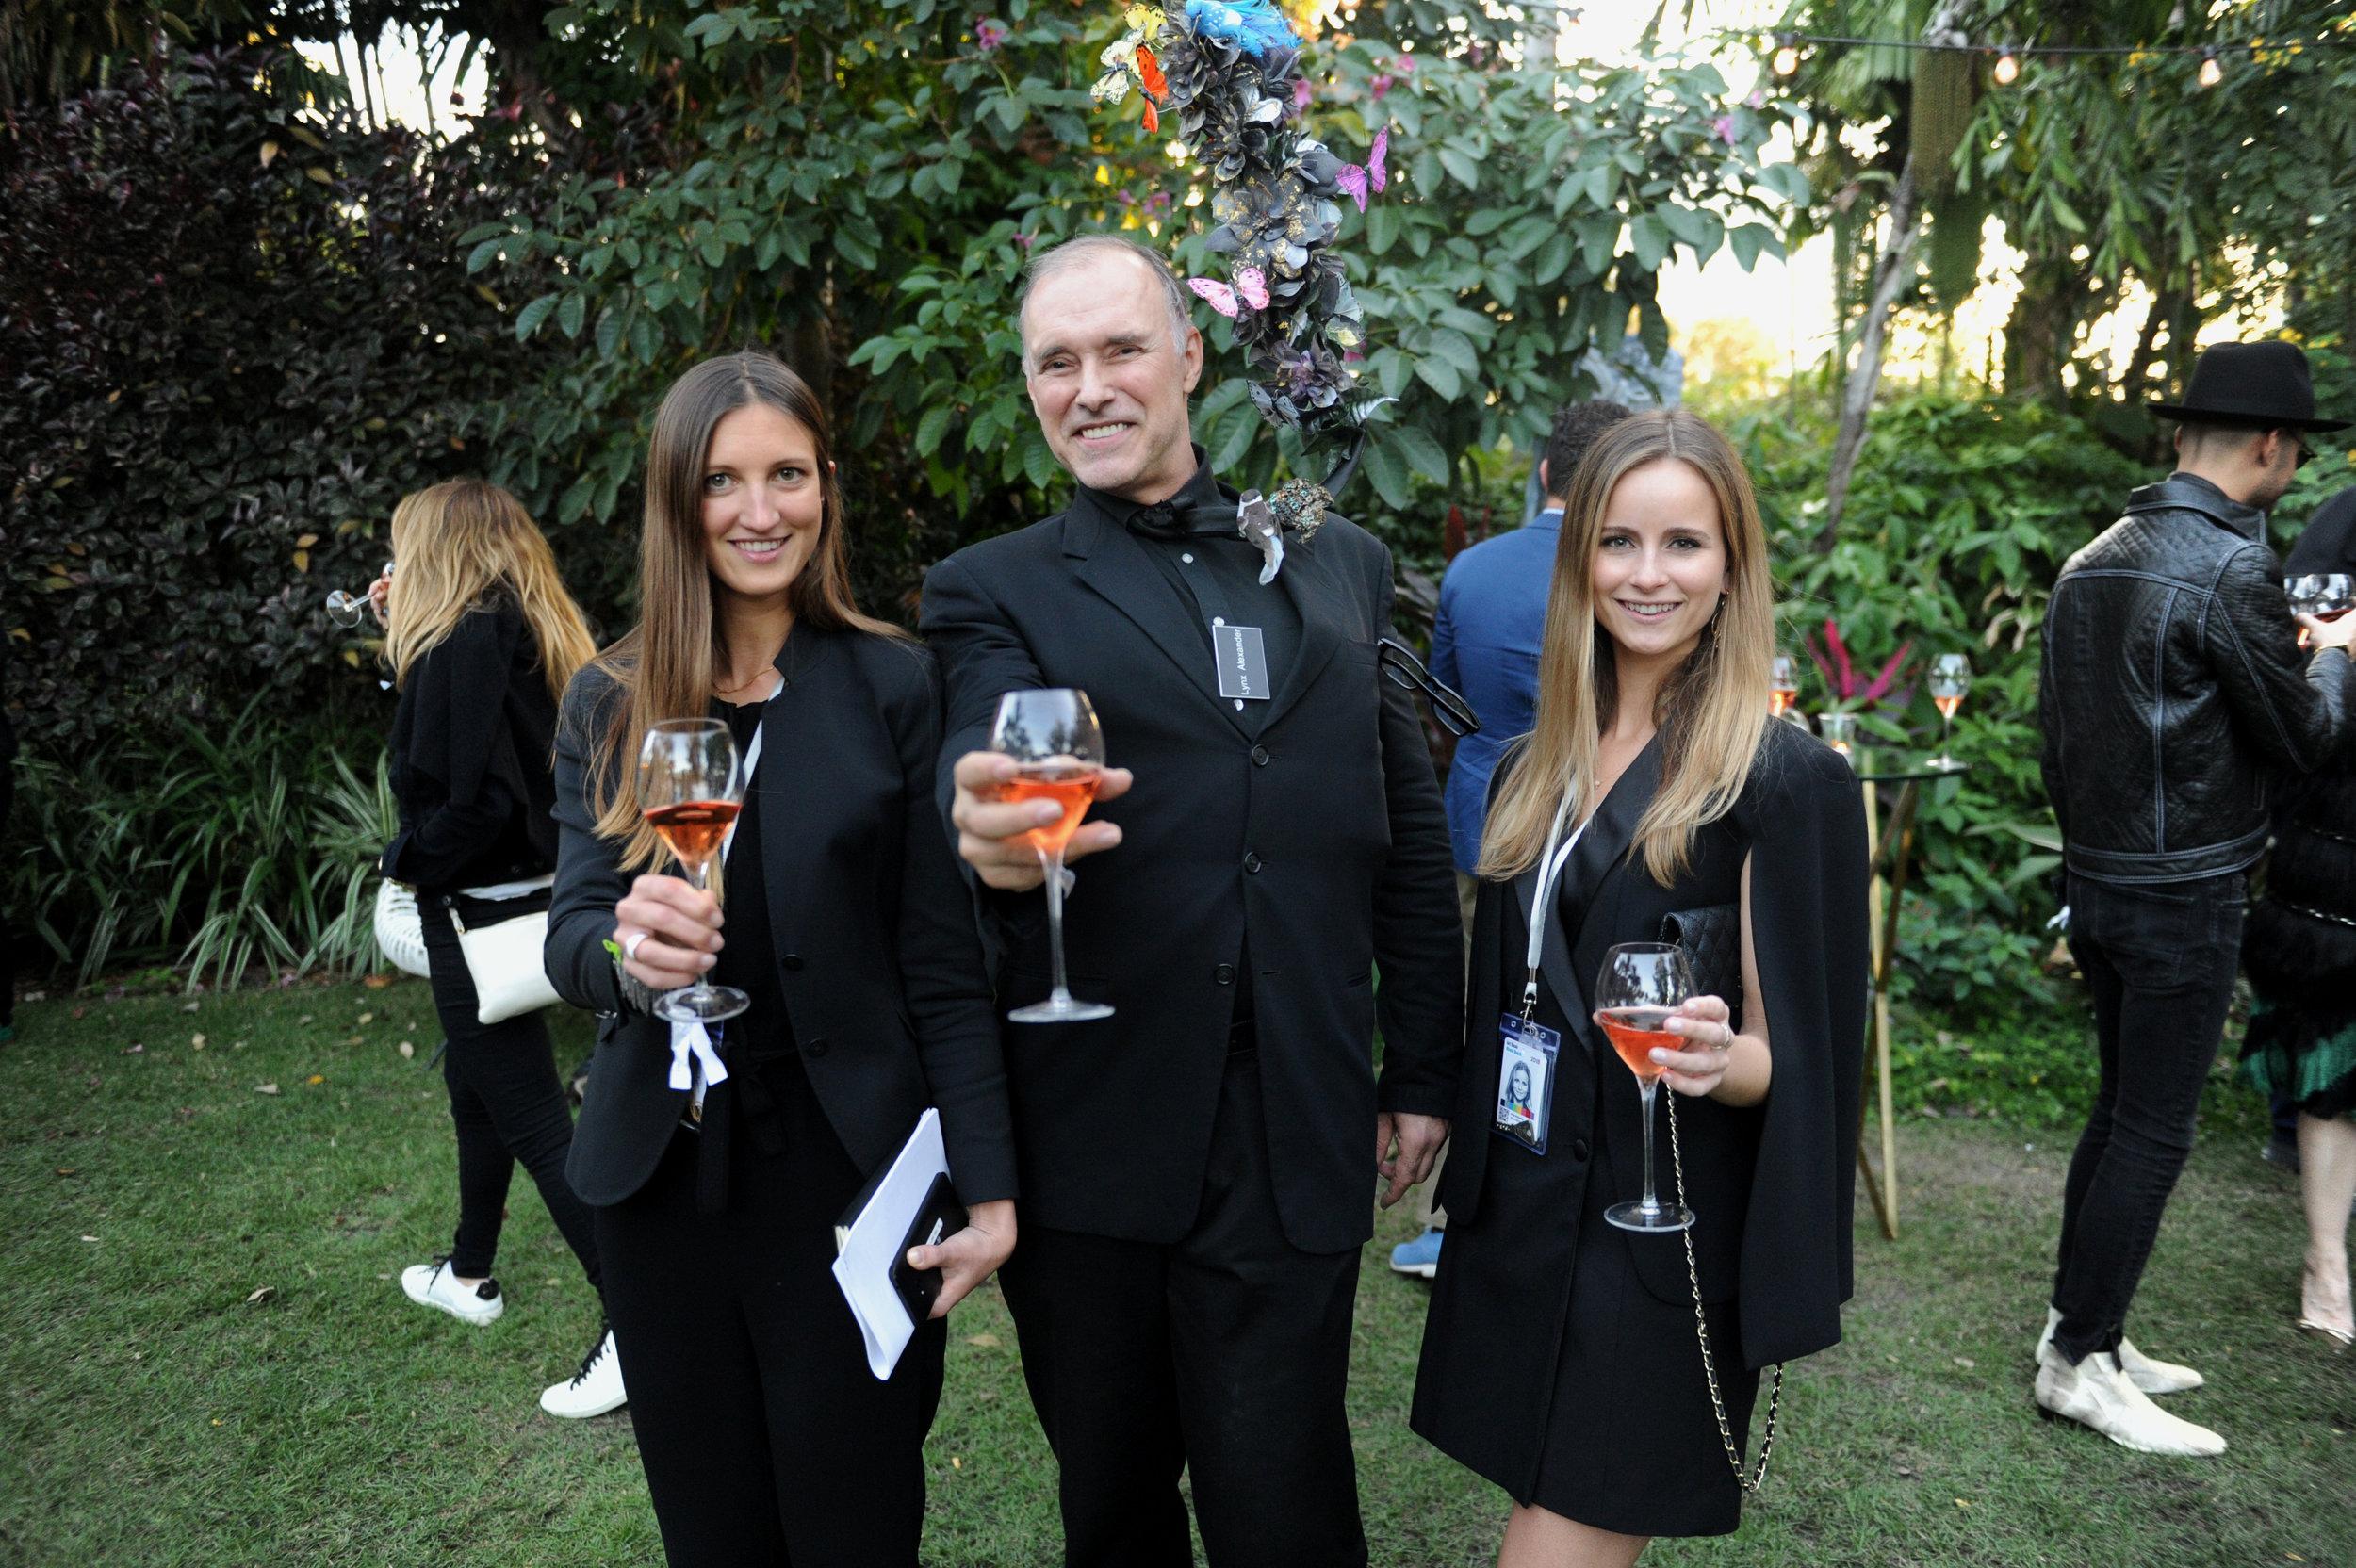 Caterina Donati, Lynx Alexander, & Anya McCarty5.JPG